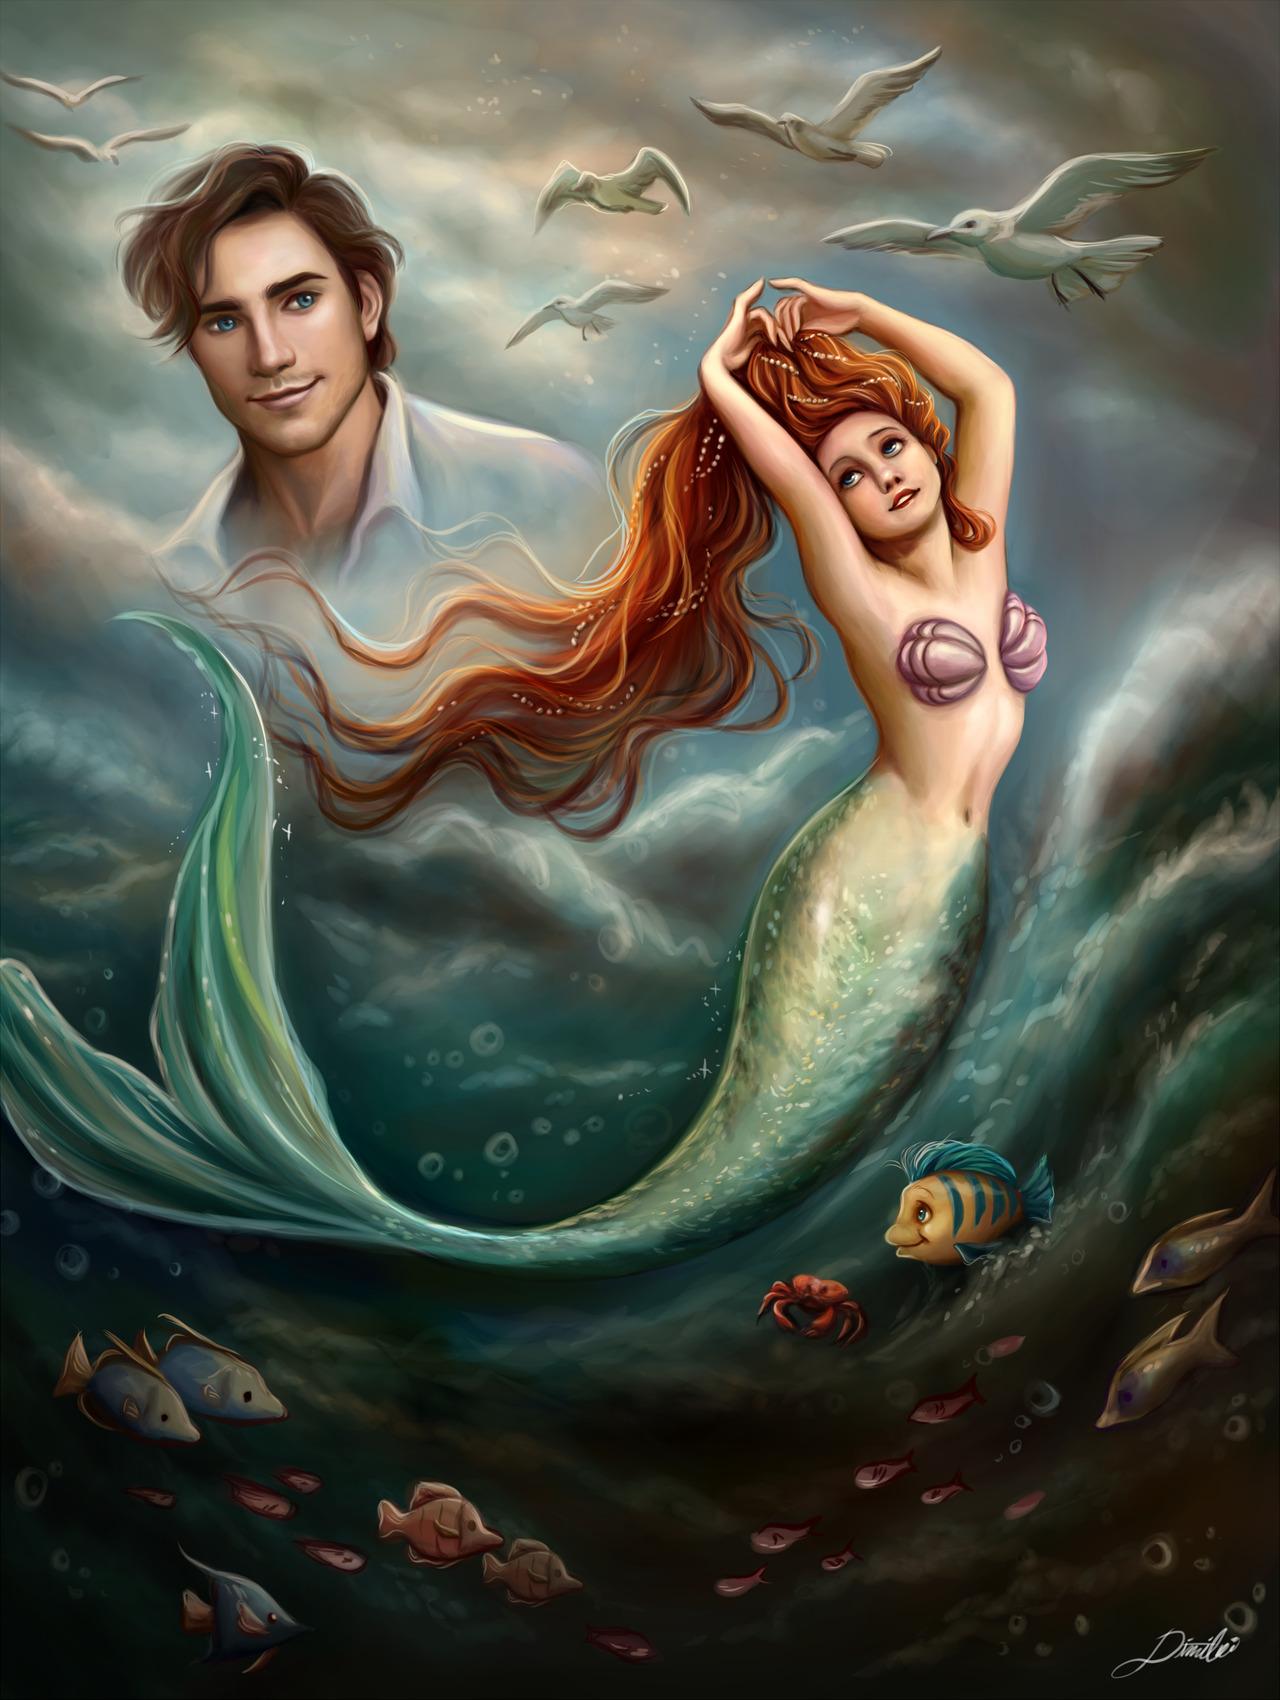 H2O: Mermaid Adventures | Soundeffects Wiki | Fandom